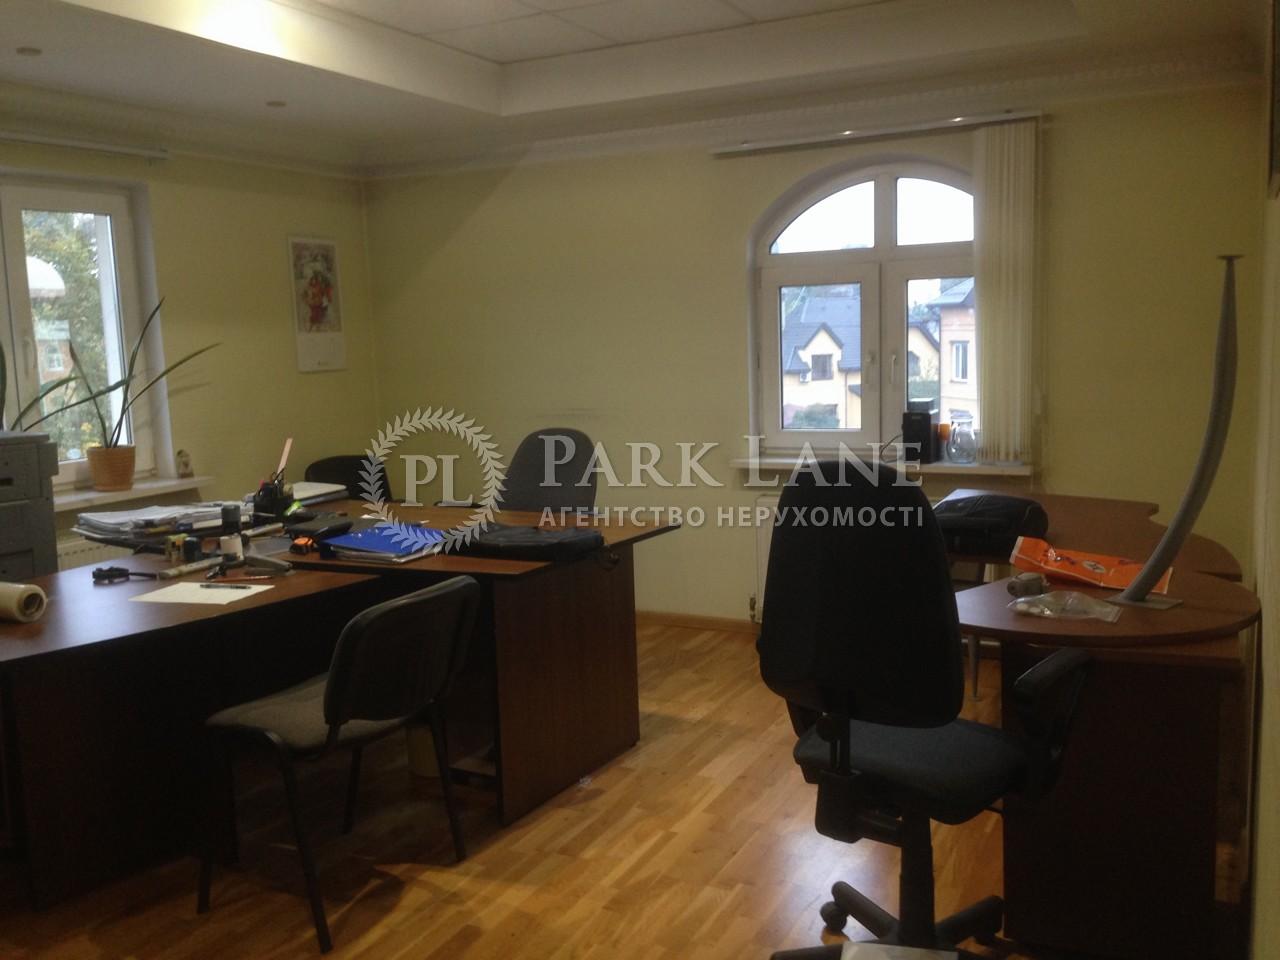 Офис, ул. Стеценко, Киев, Z-490577 - Фото 6